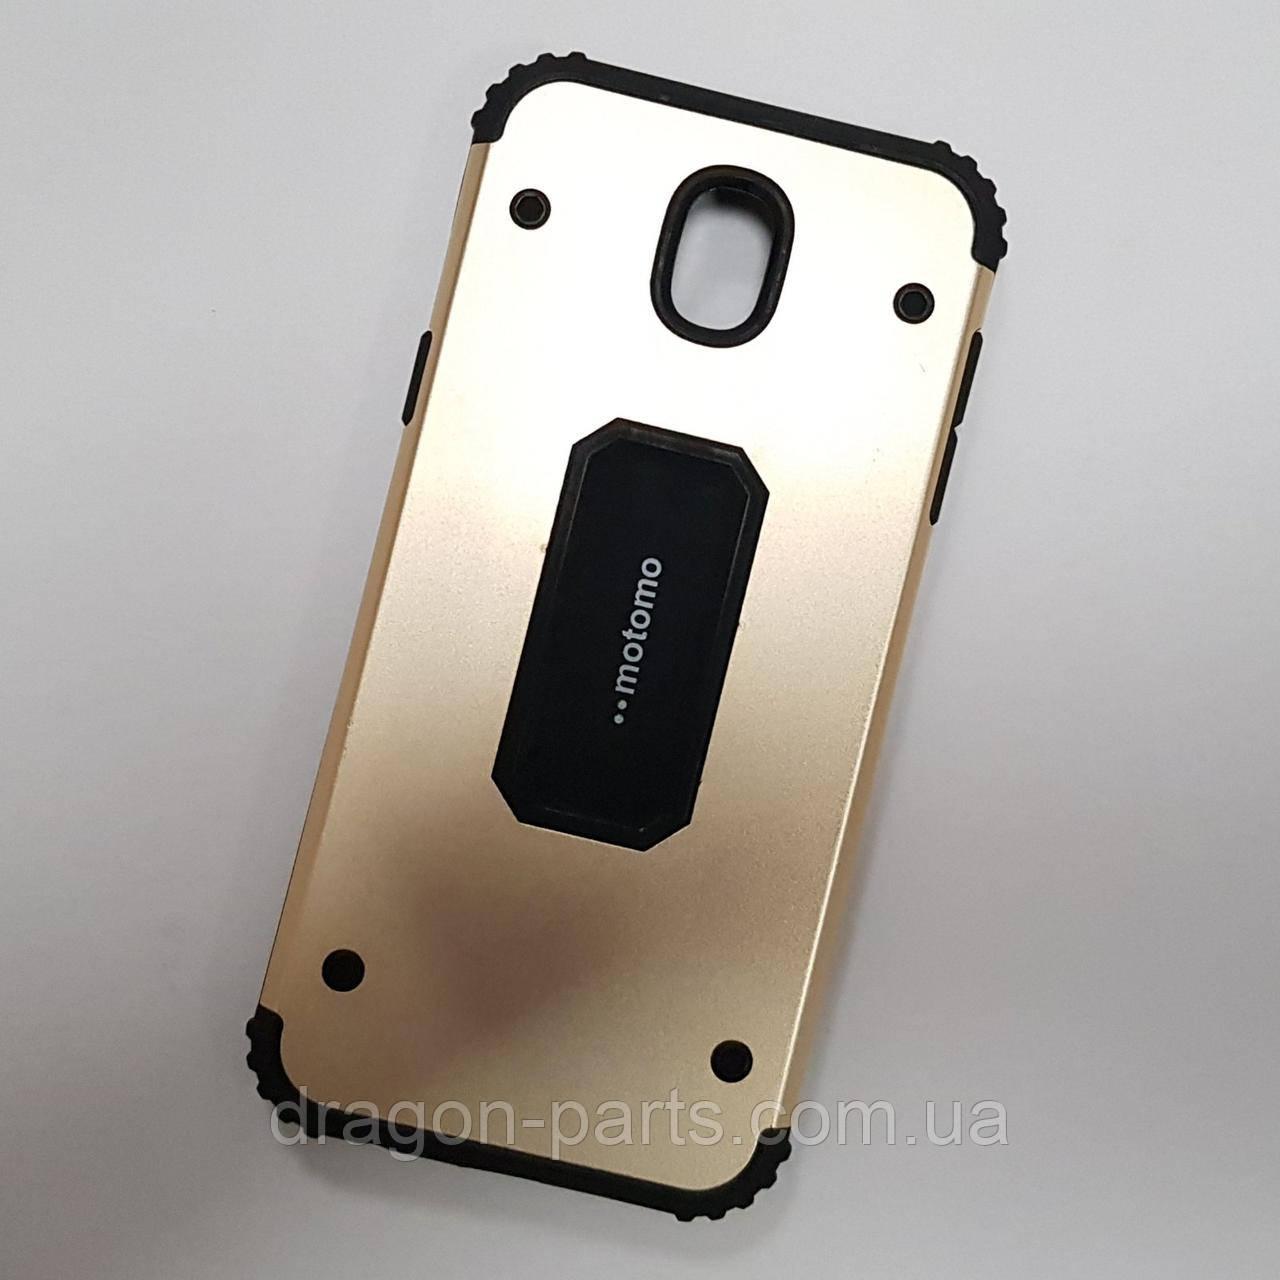 Чехол бампер Motomo для Samsung Galaxy J5 J530 2017 золотой